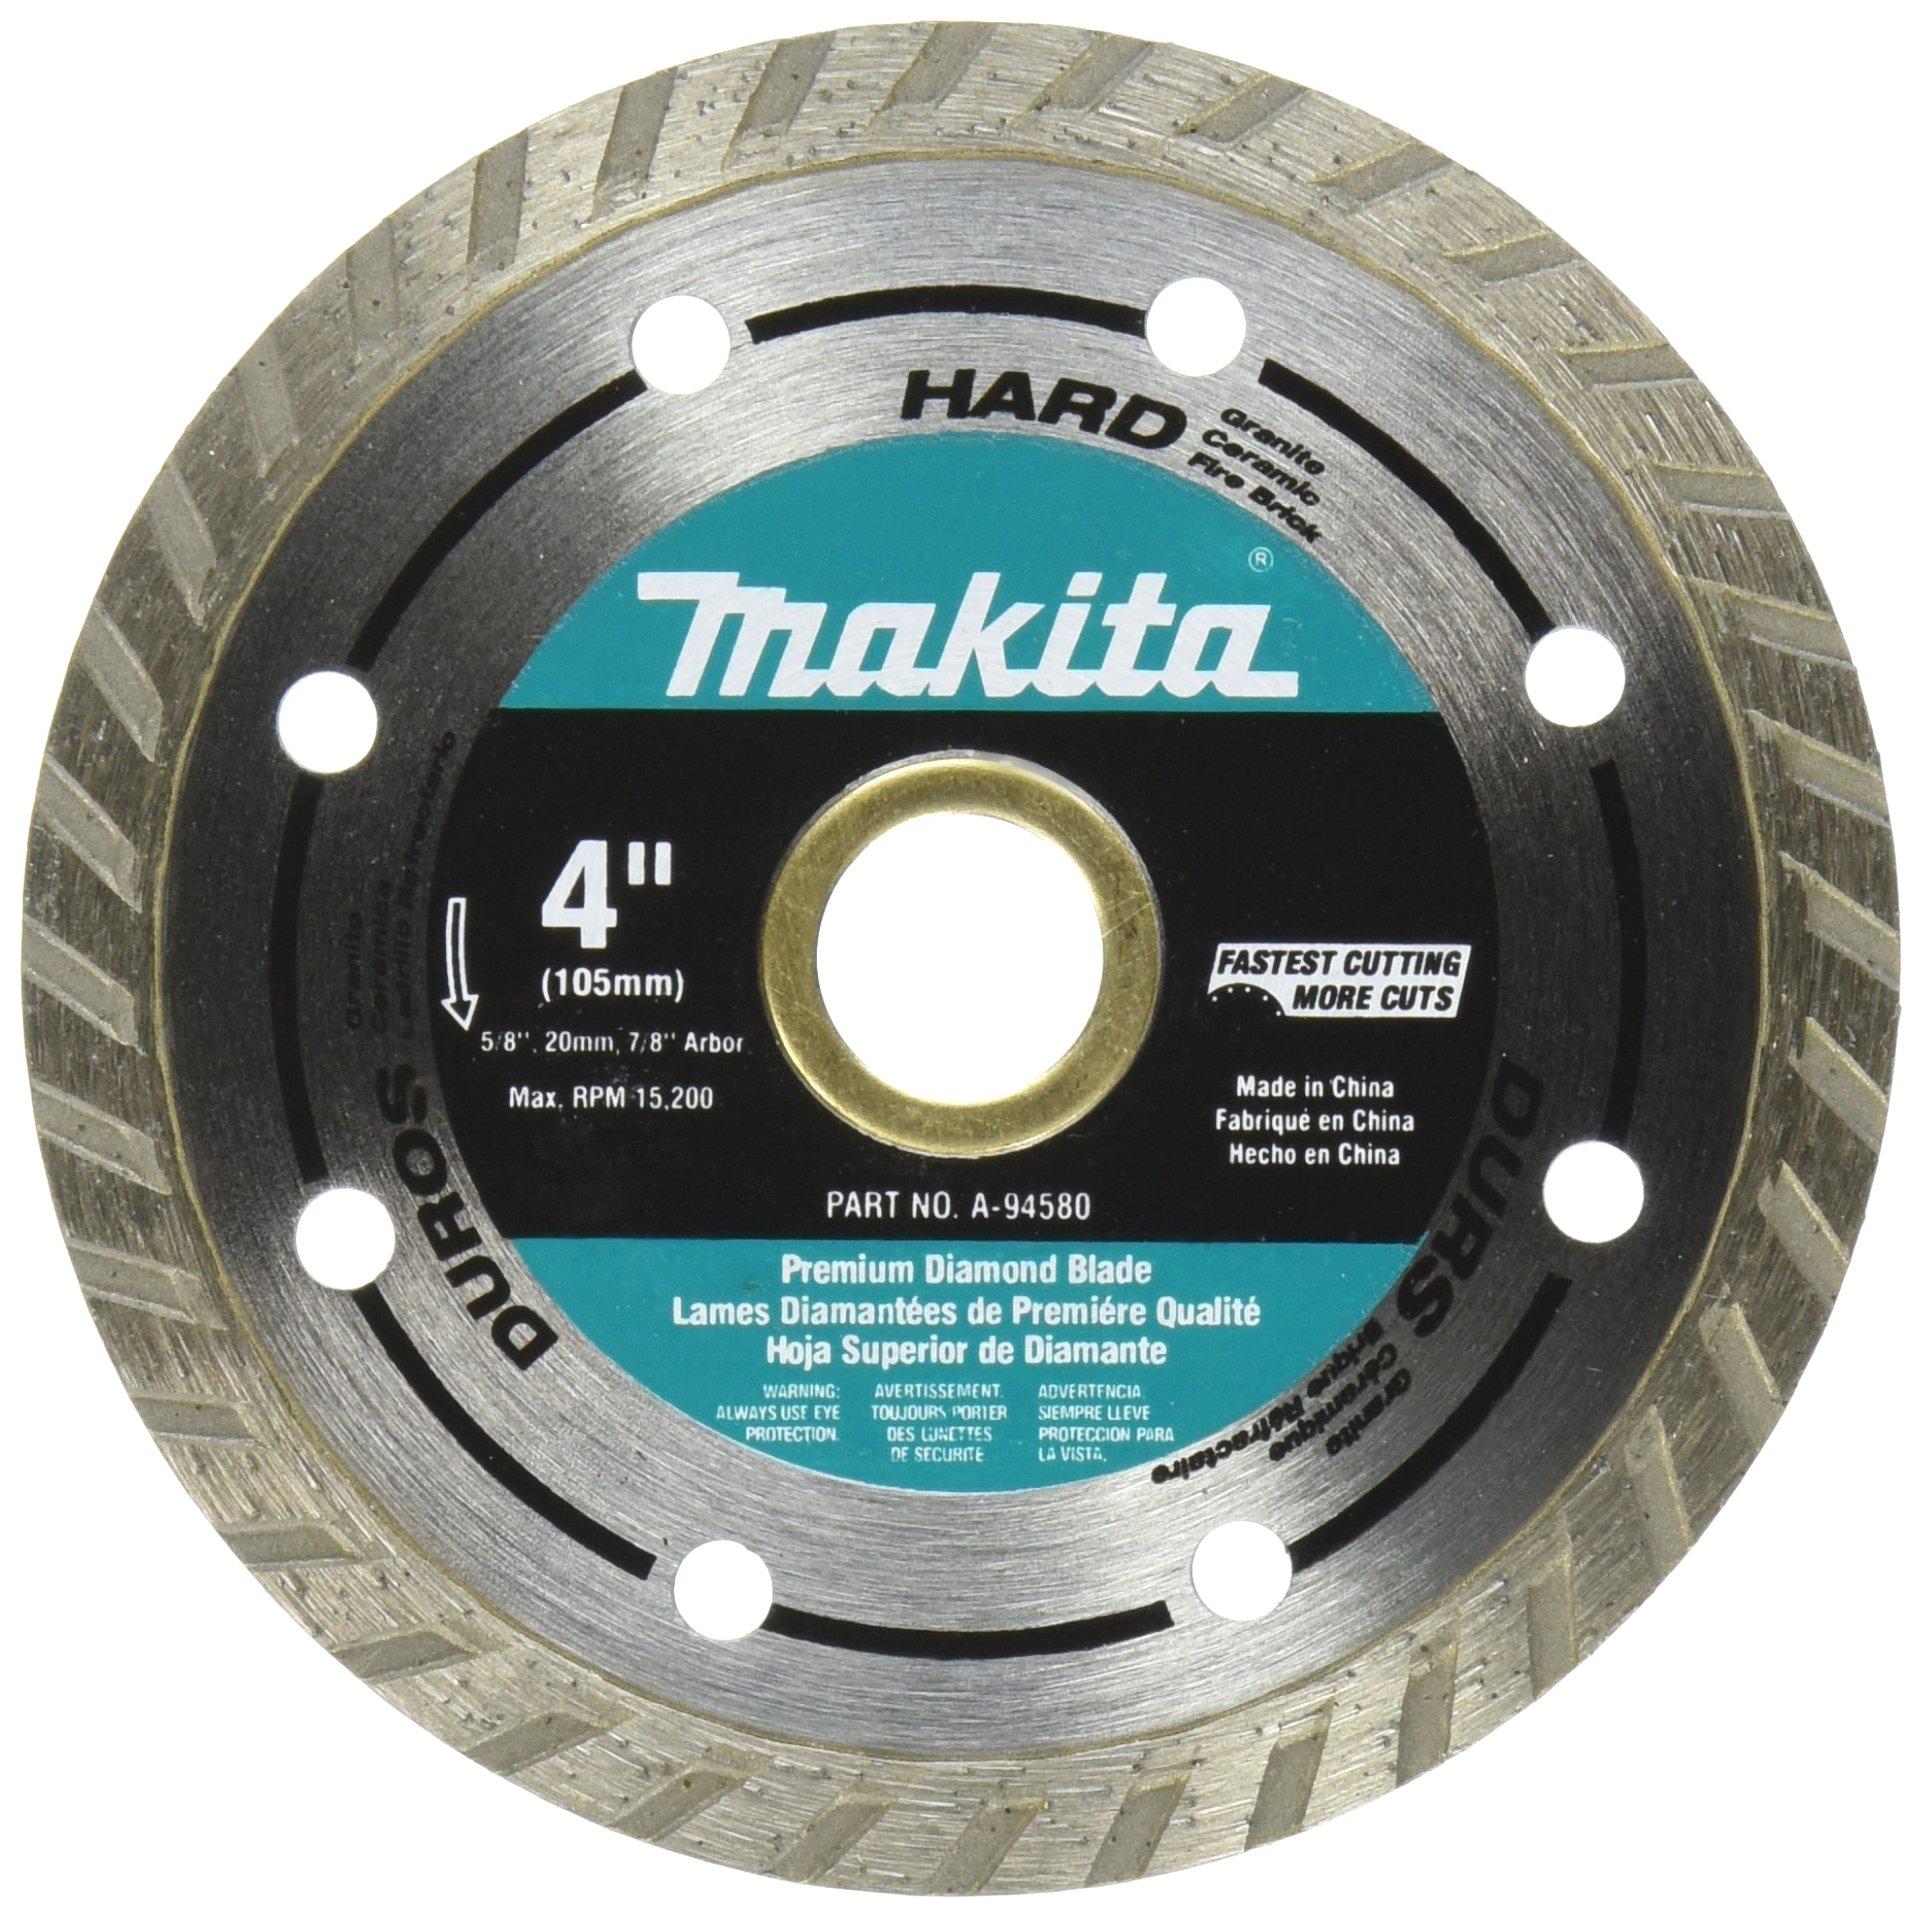 Disco de Diamante MAKITA A-94580 de material duro turbo de 4 pulg.